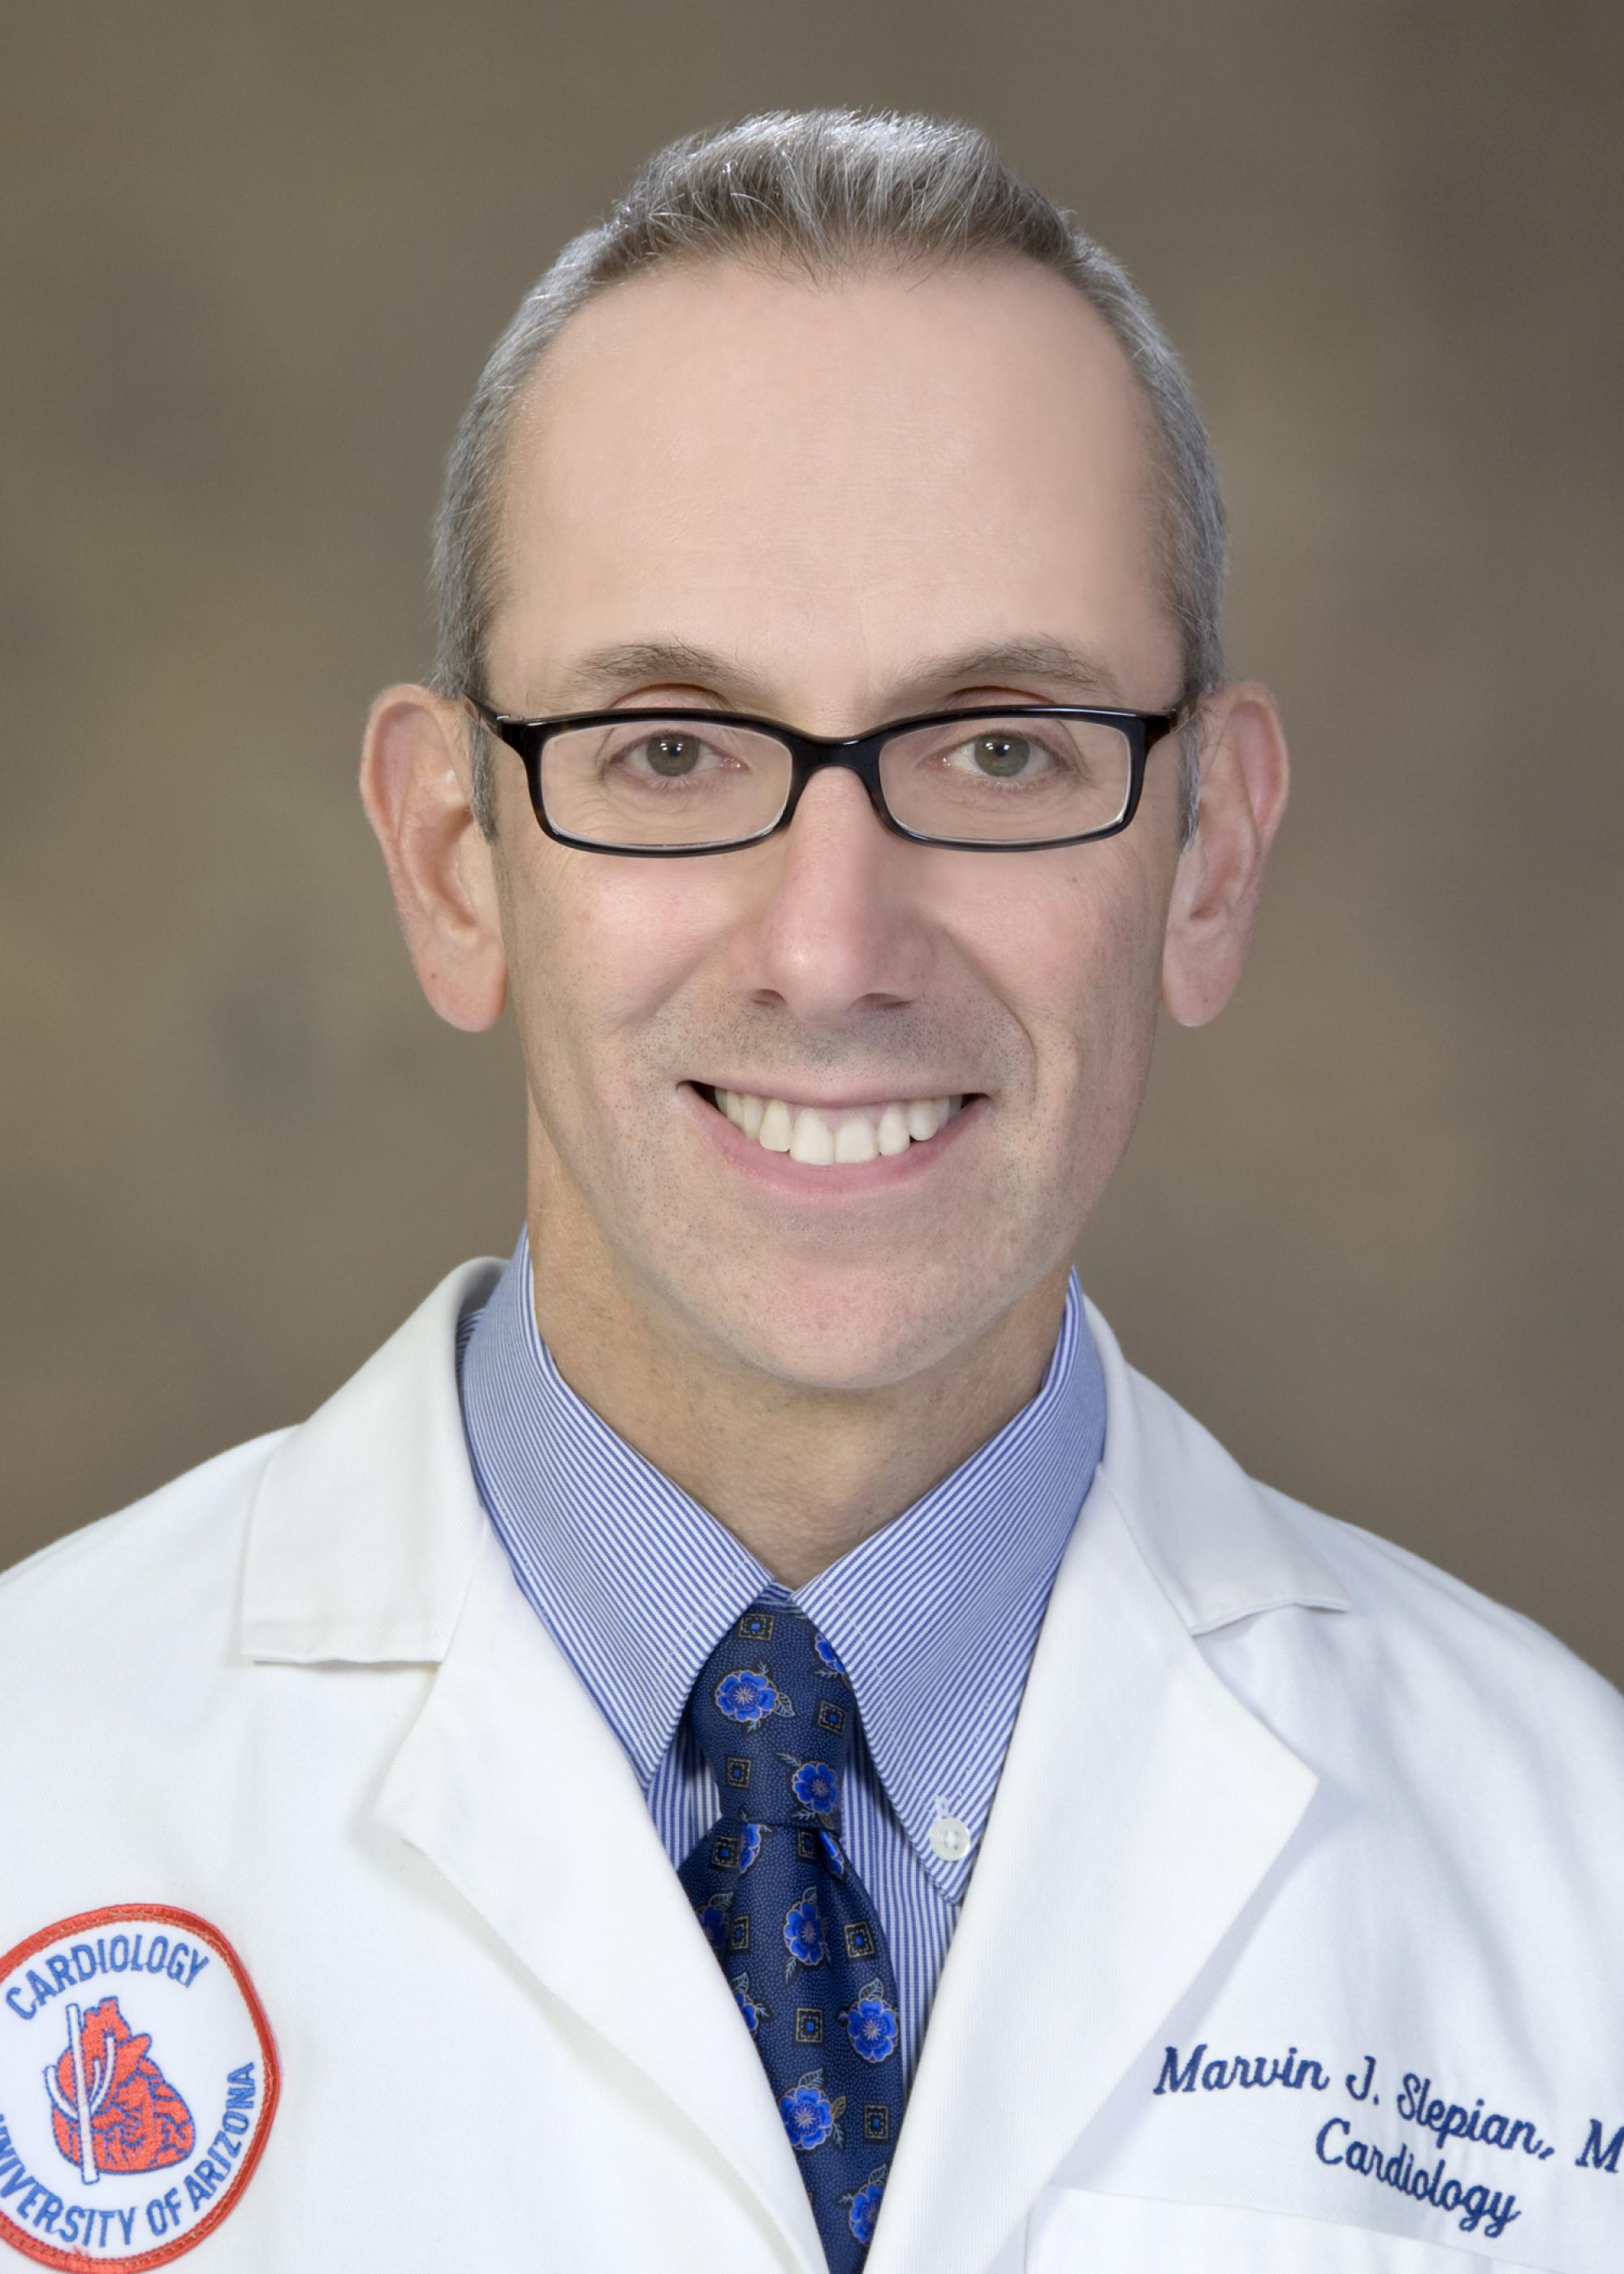 Dr. Marvin J. Slepian